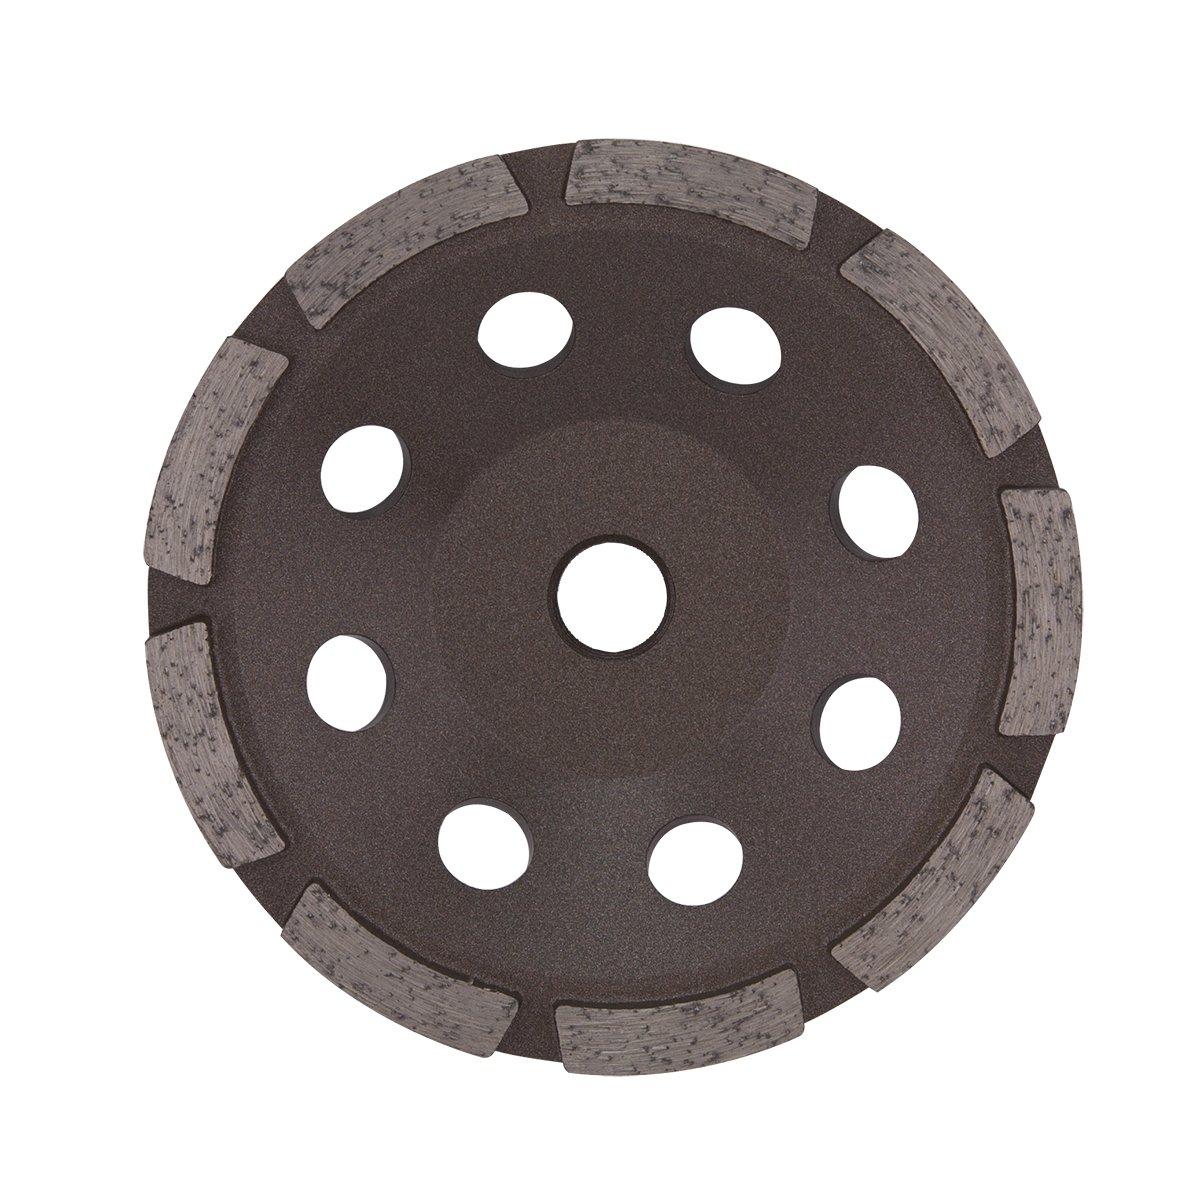 EAB Tool 2118805 4 1/2'' Cupstone Single Bronze Diamond Blade - Recyclable,